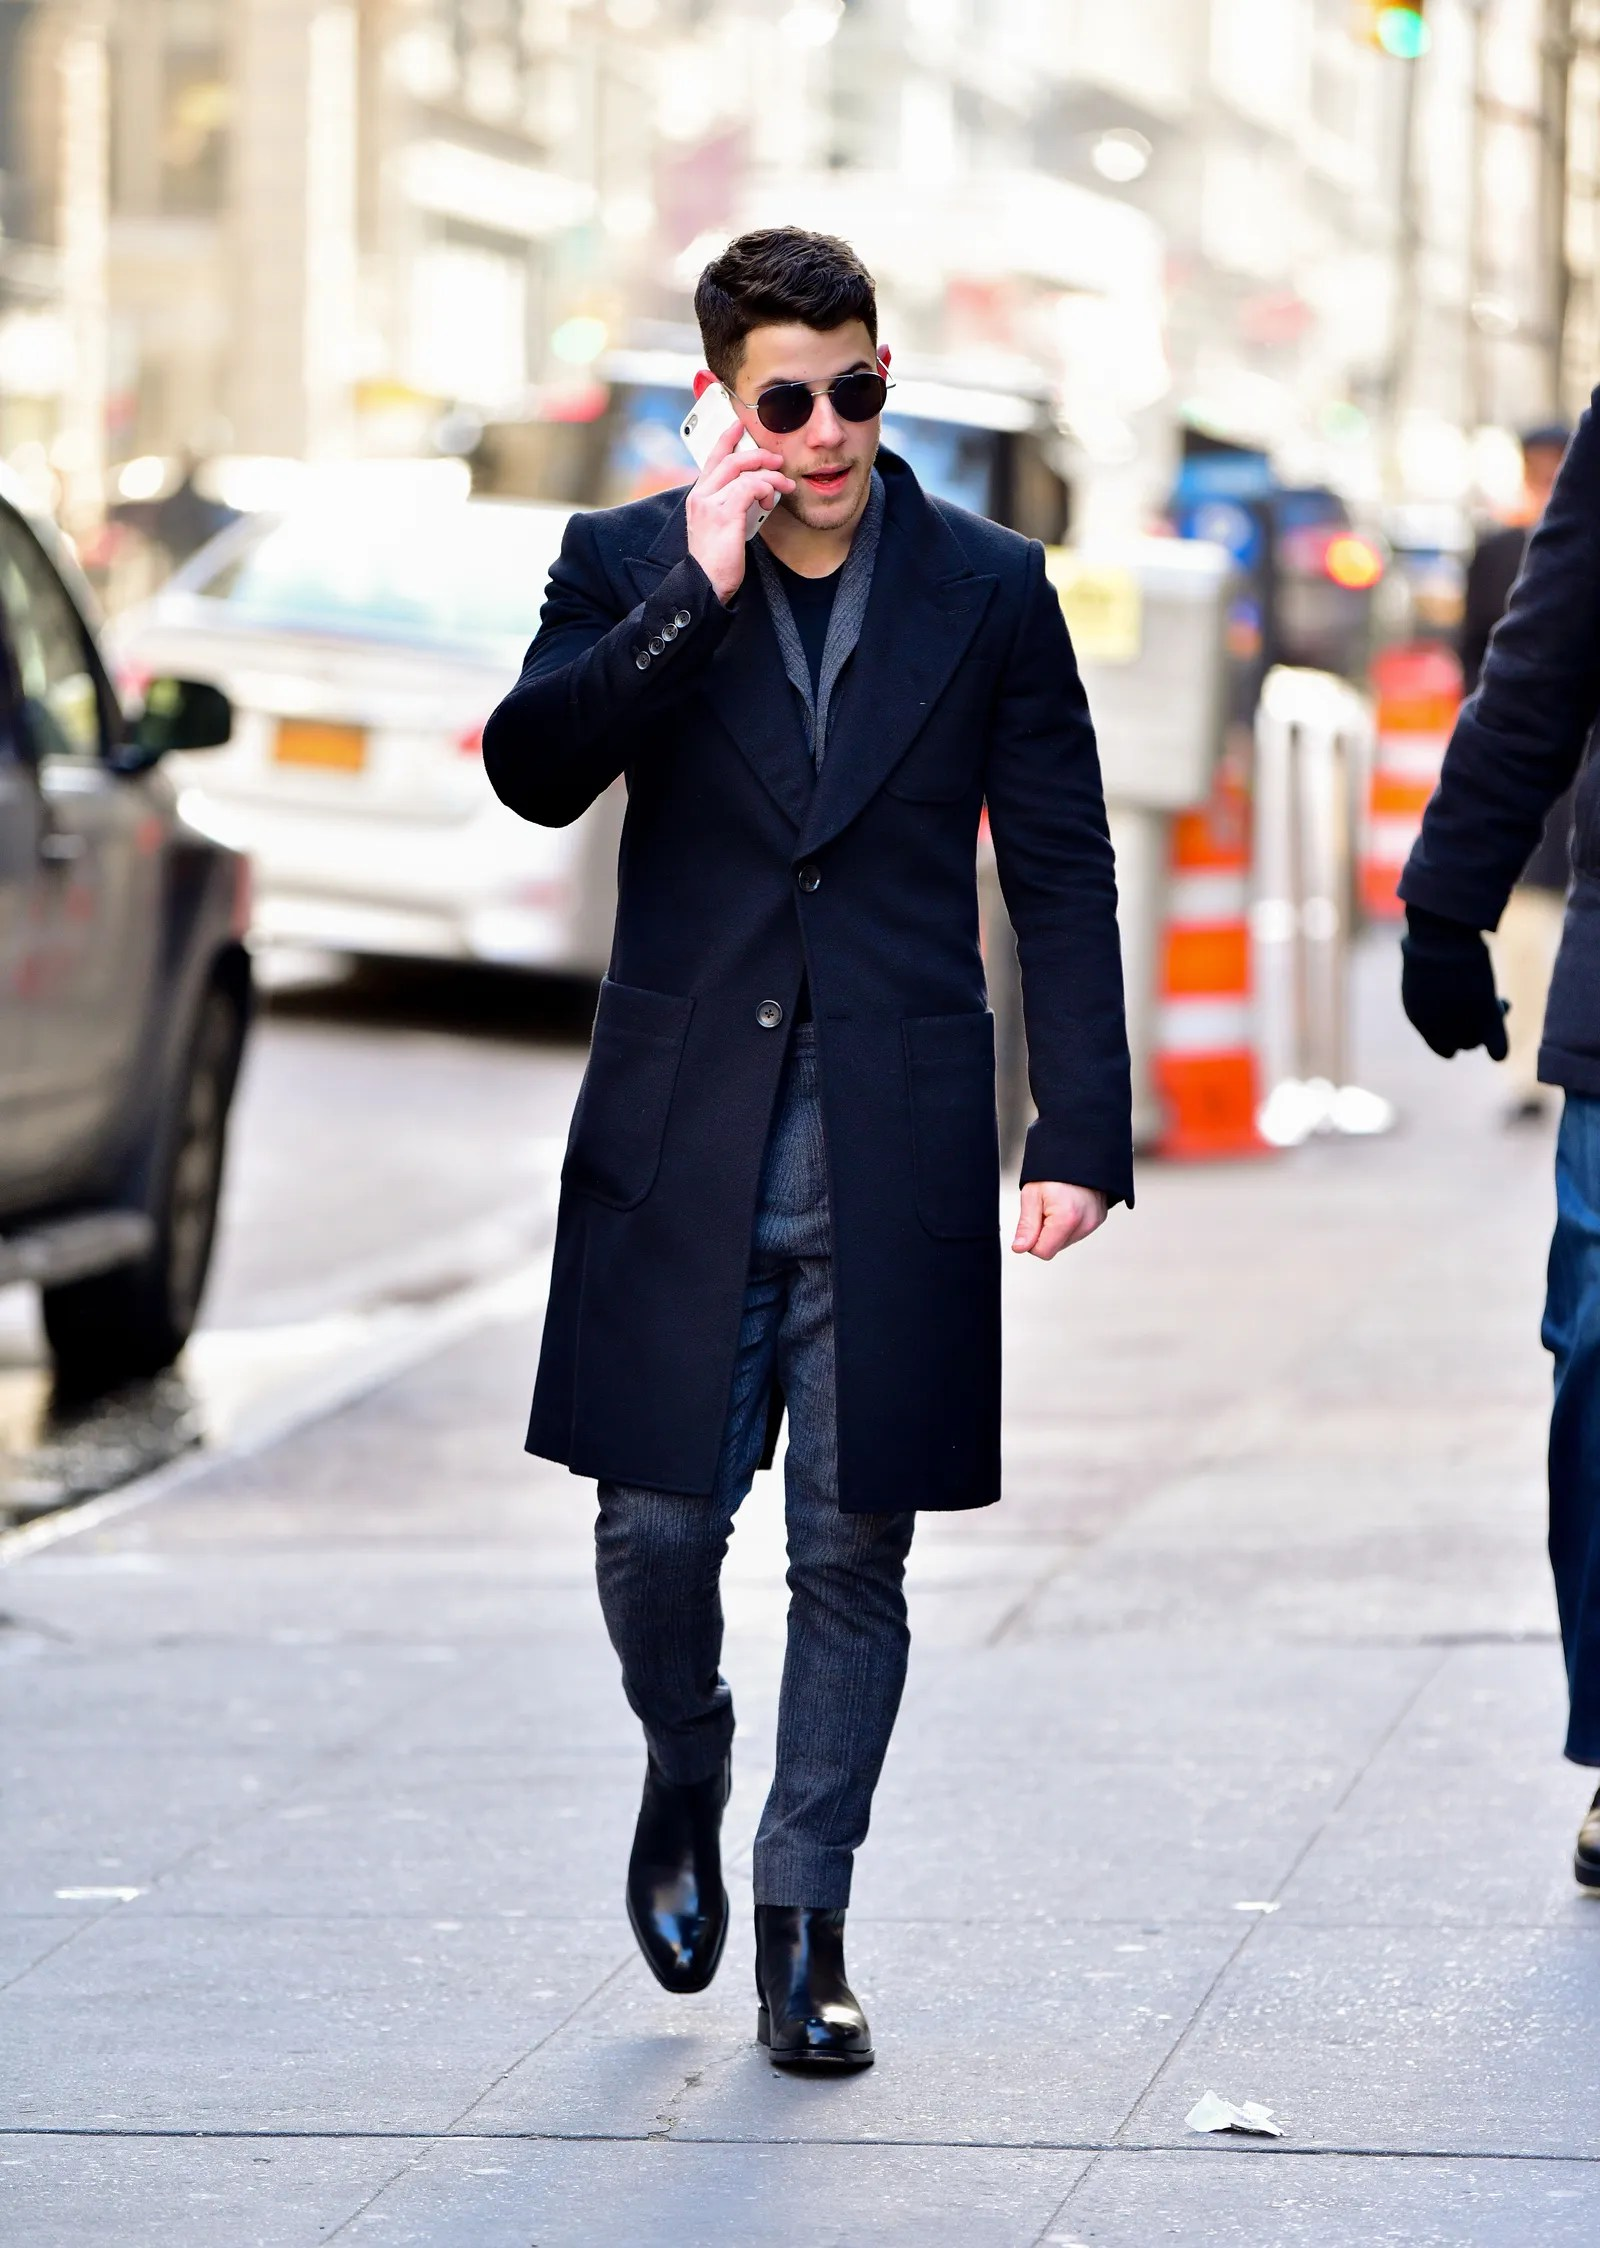 NEW YORK NY JANUARY 31 Nick Jonas seen walking in the Flatiron District on January 31 2018 in New York City.